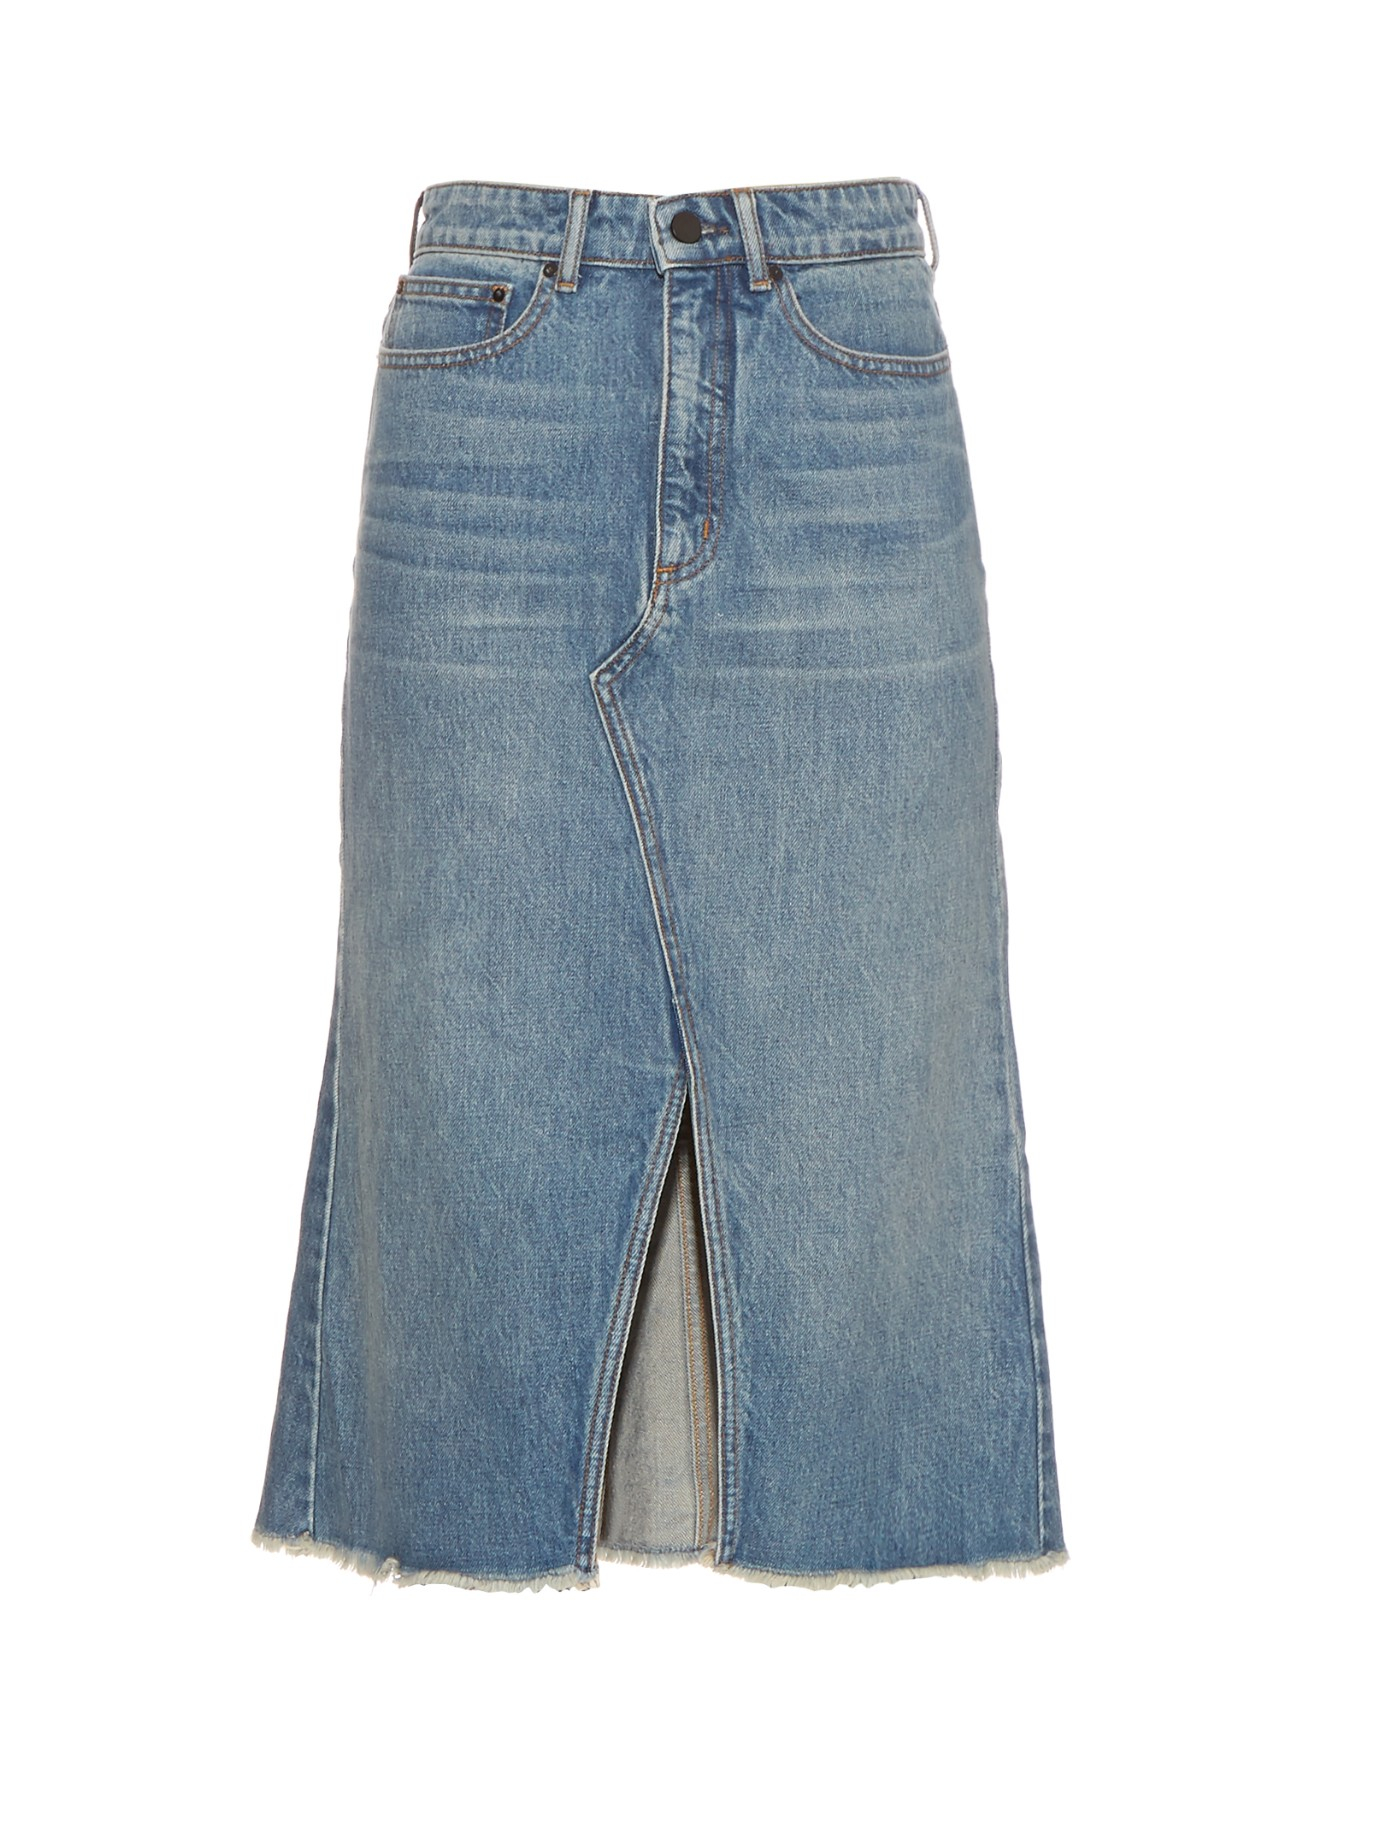 Alexander wang Split-front Denim Skirt in Pink | Lyst